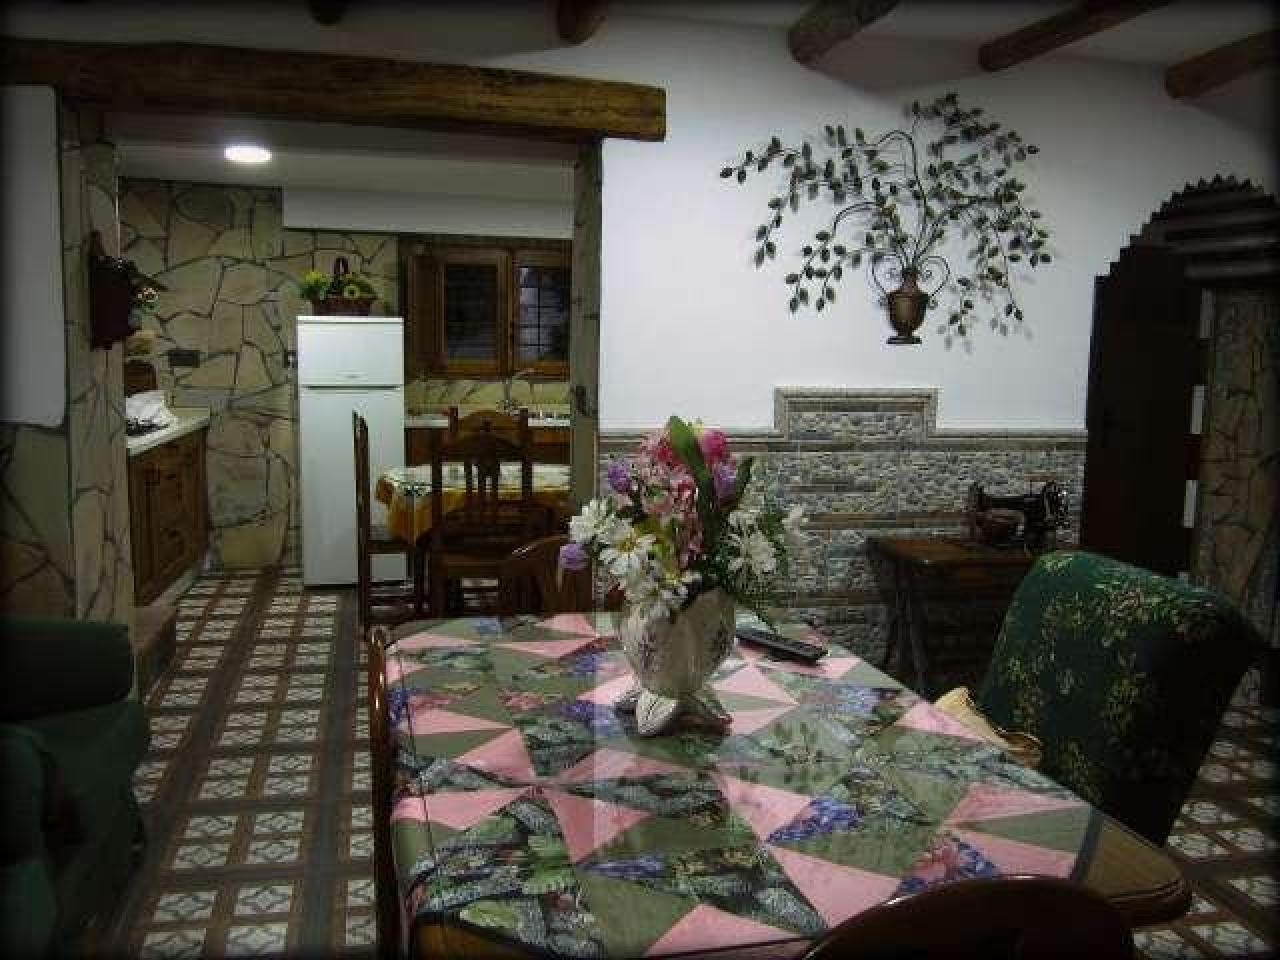 Apartamento vacacional Castillo de Locubín, Jaén